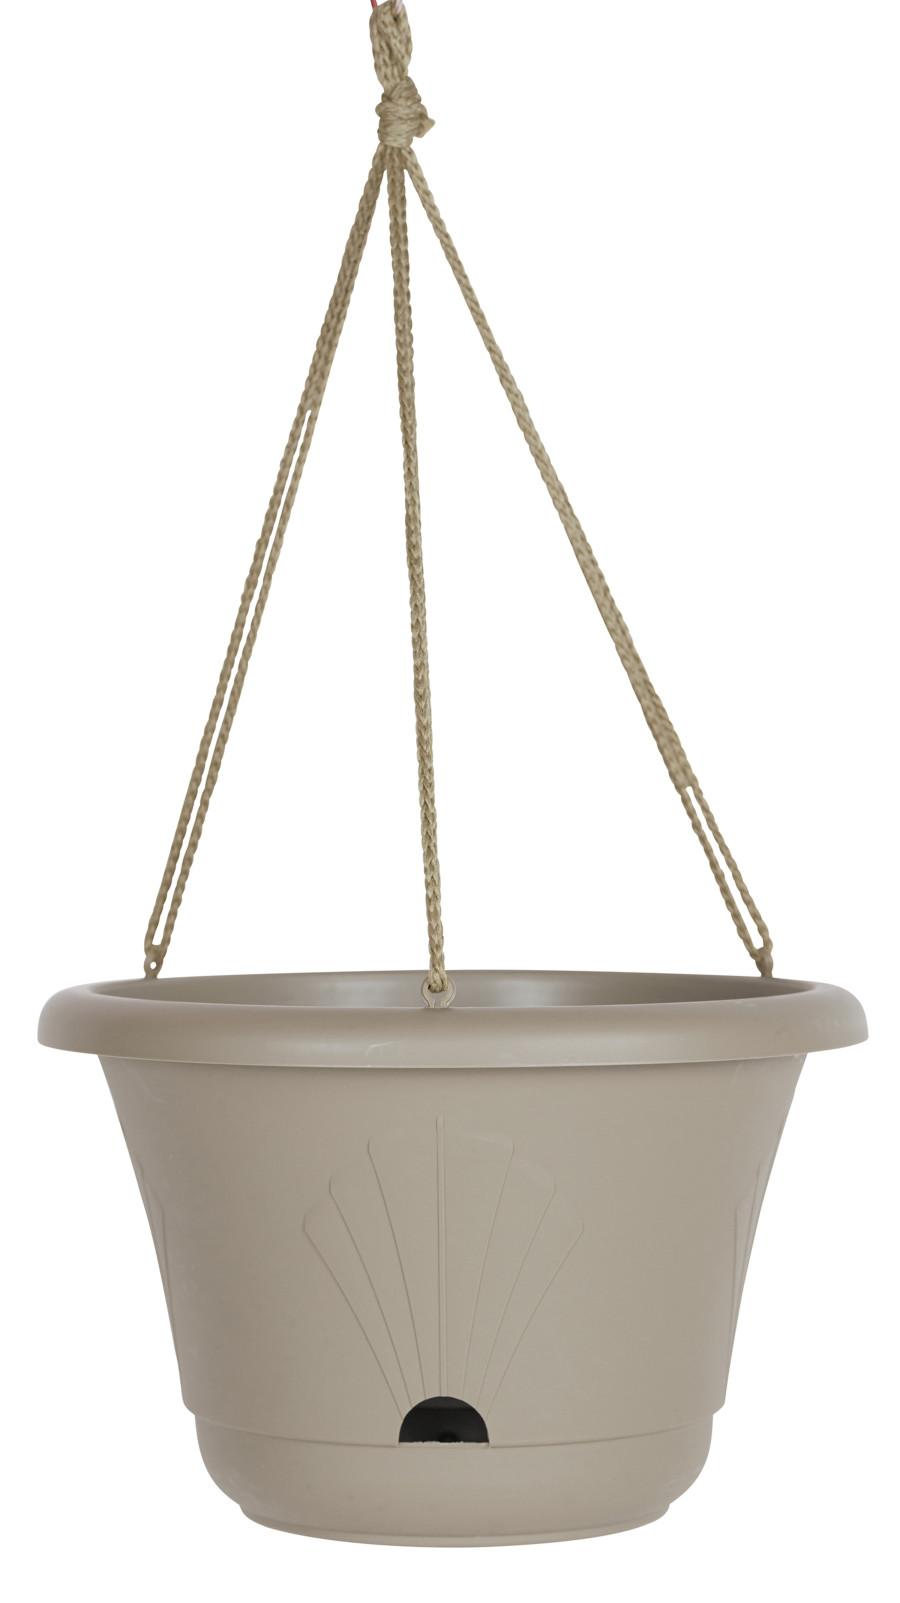 Bloem Lucca Hanging Basket Planter Pebble Stone 10ea/13 in